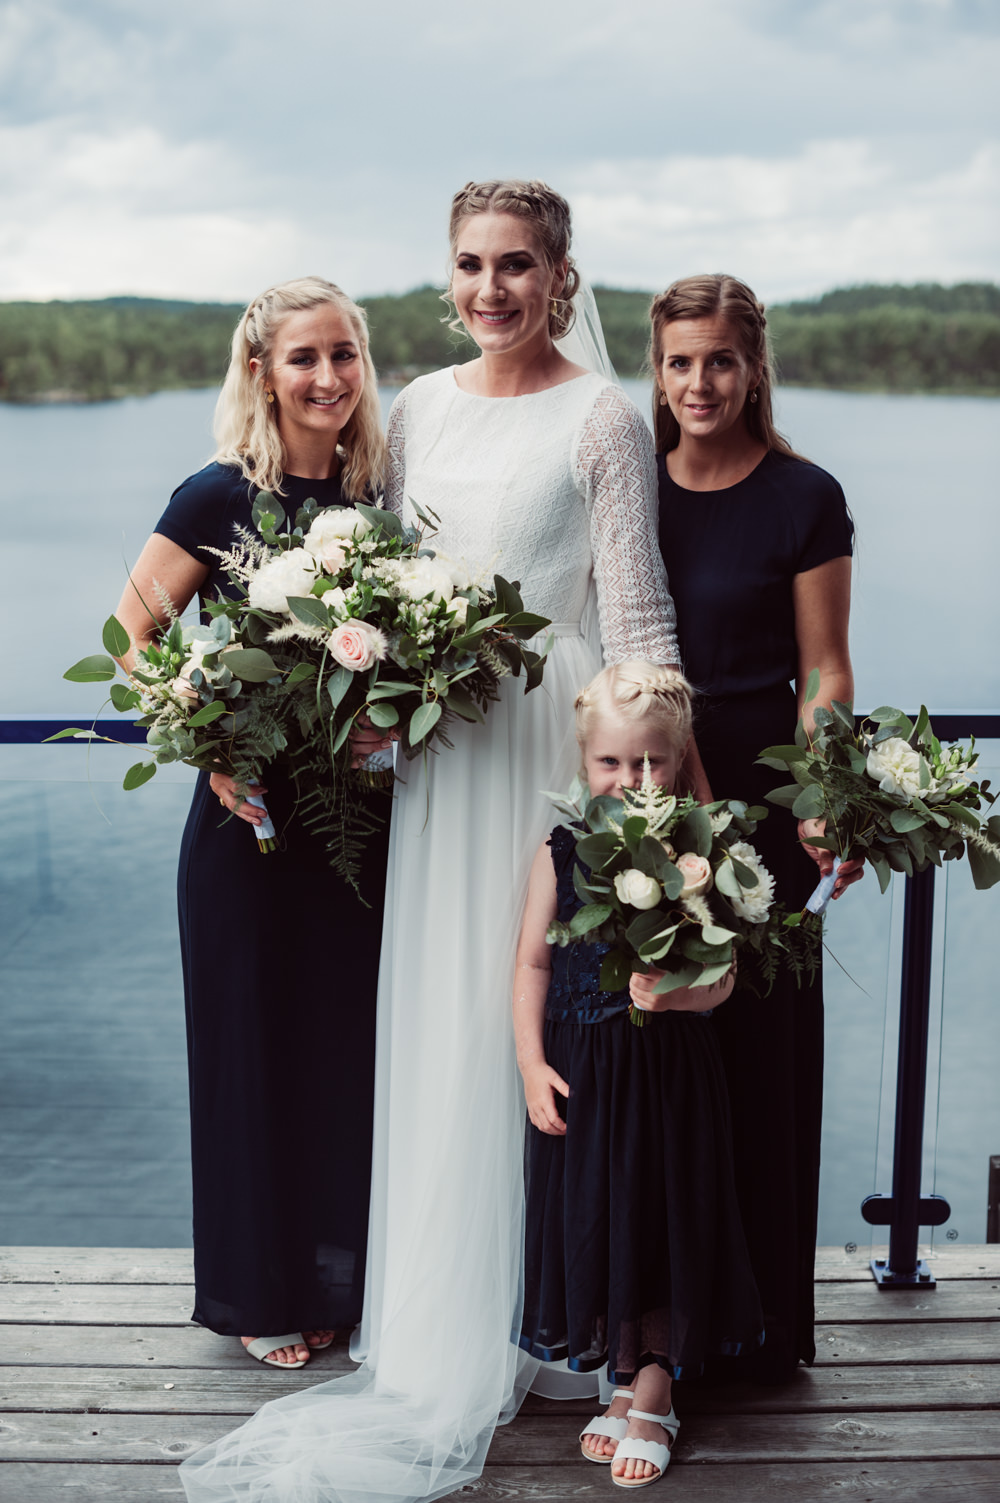 Bridesmaids Bridesmaid Dress Dresses Long Norway Wedding Maximilian Photography